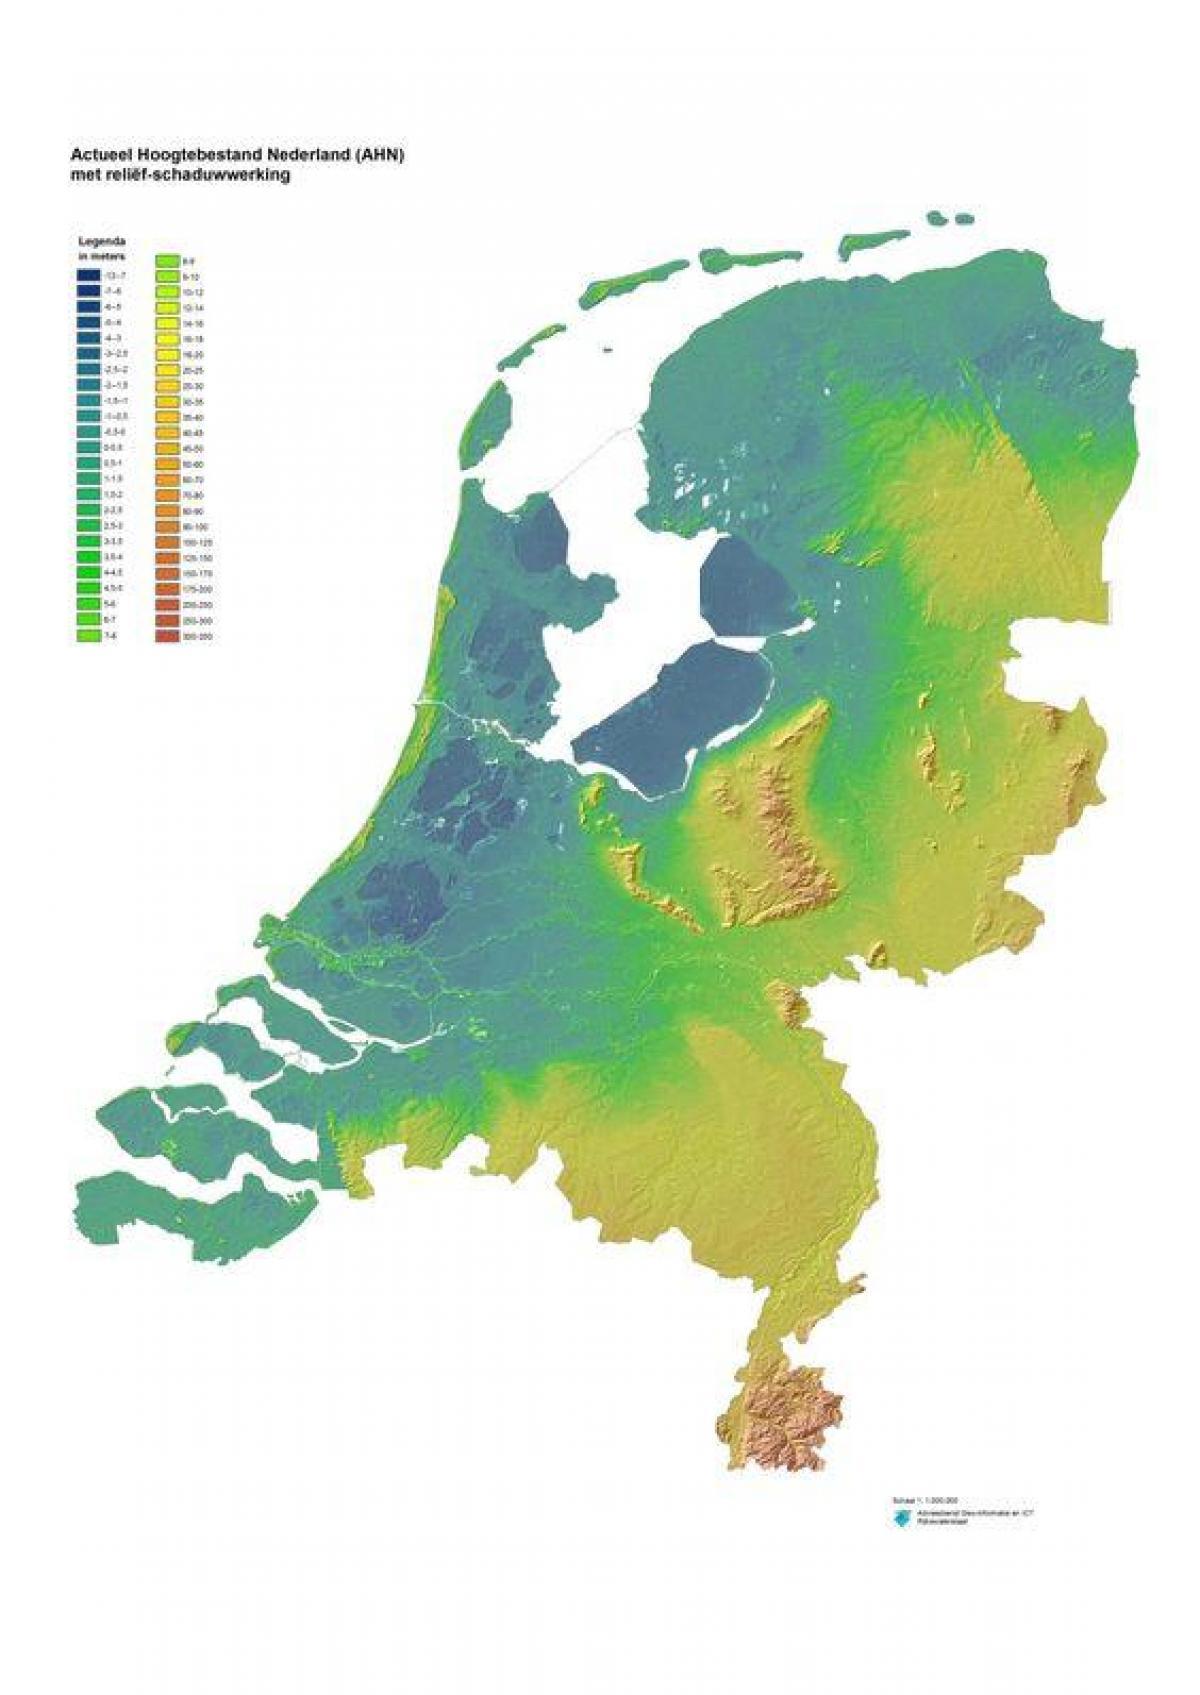 Olanda Cartina Fisica.Paesi Bassi Mappa Topografica Mappa Fisica Dei Paesi Bassi Europa Occidentale Europa